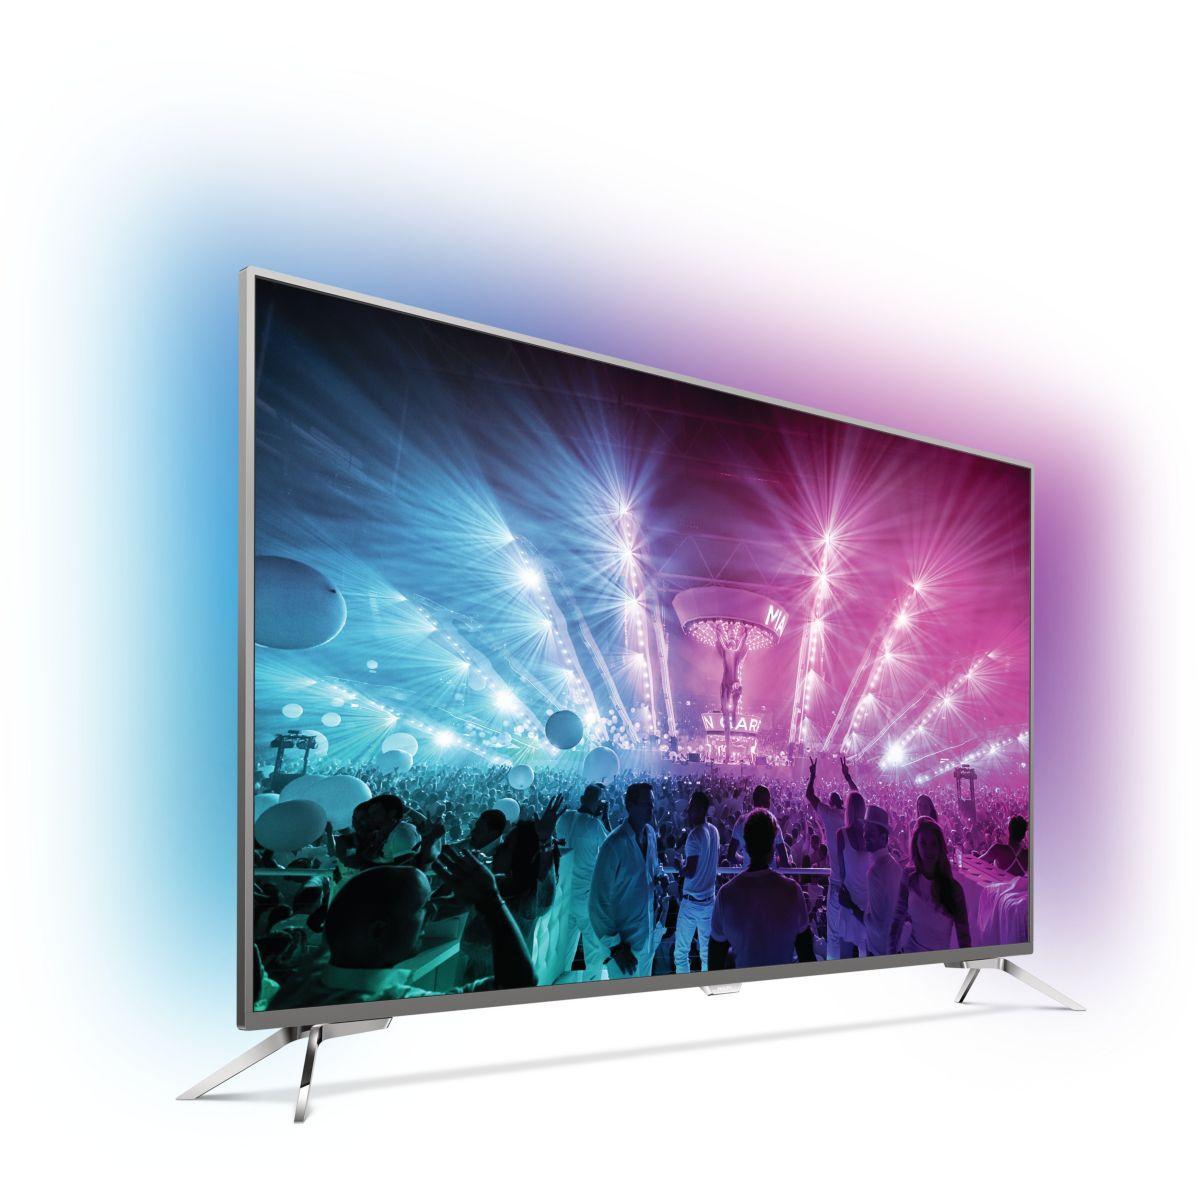 TV PHILIPS 49PUS7101 4K 2000 PPI SMART TV